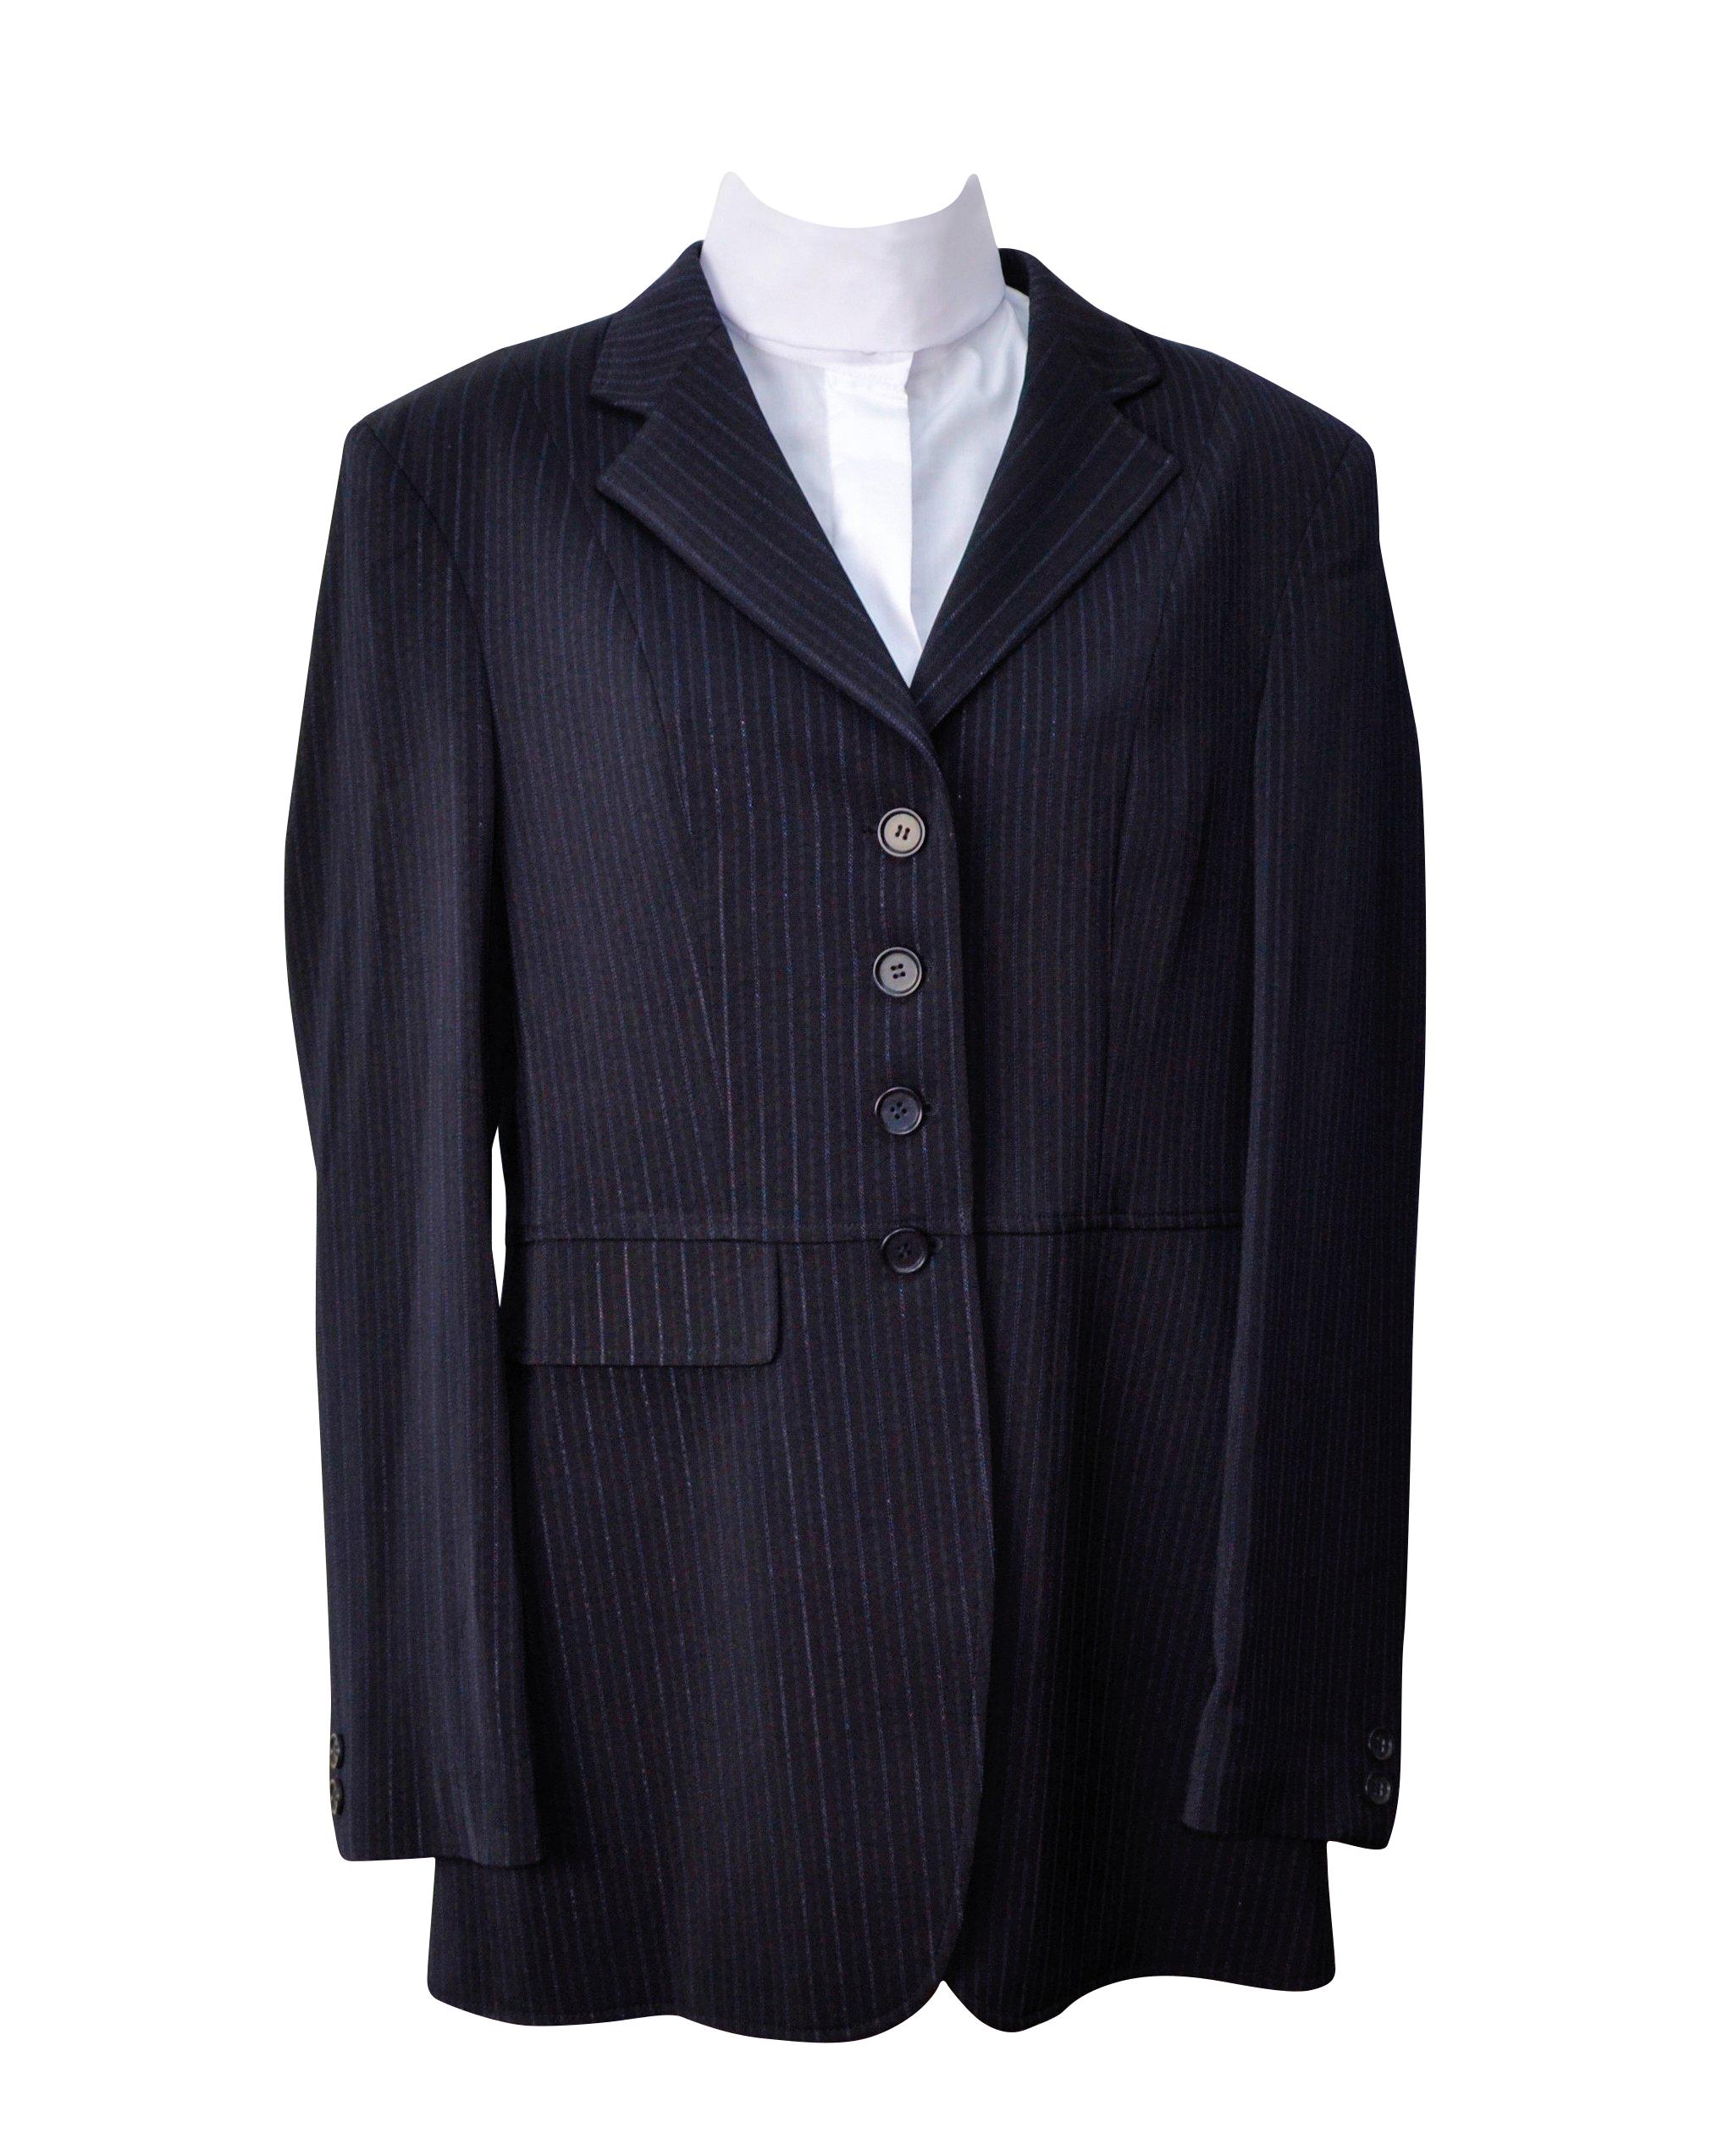 Wellington Collection Ladies' Dressage Coat